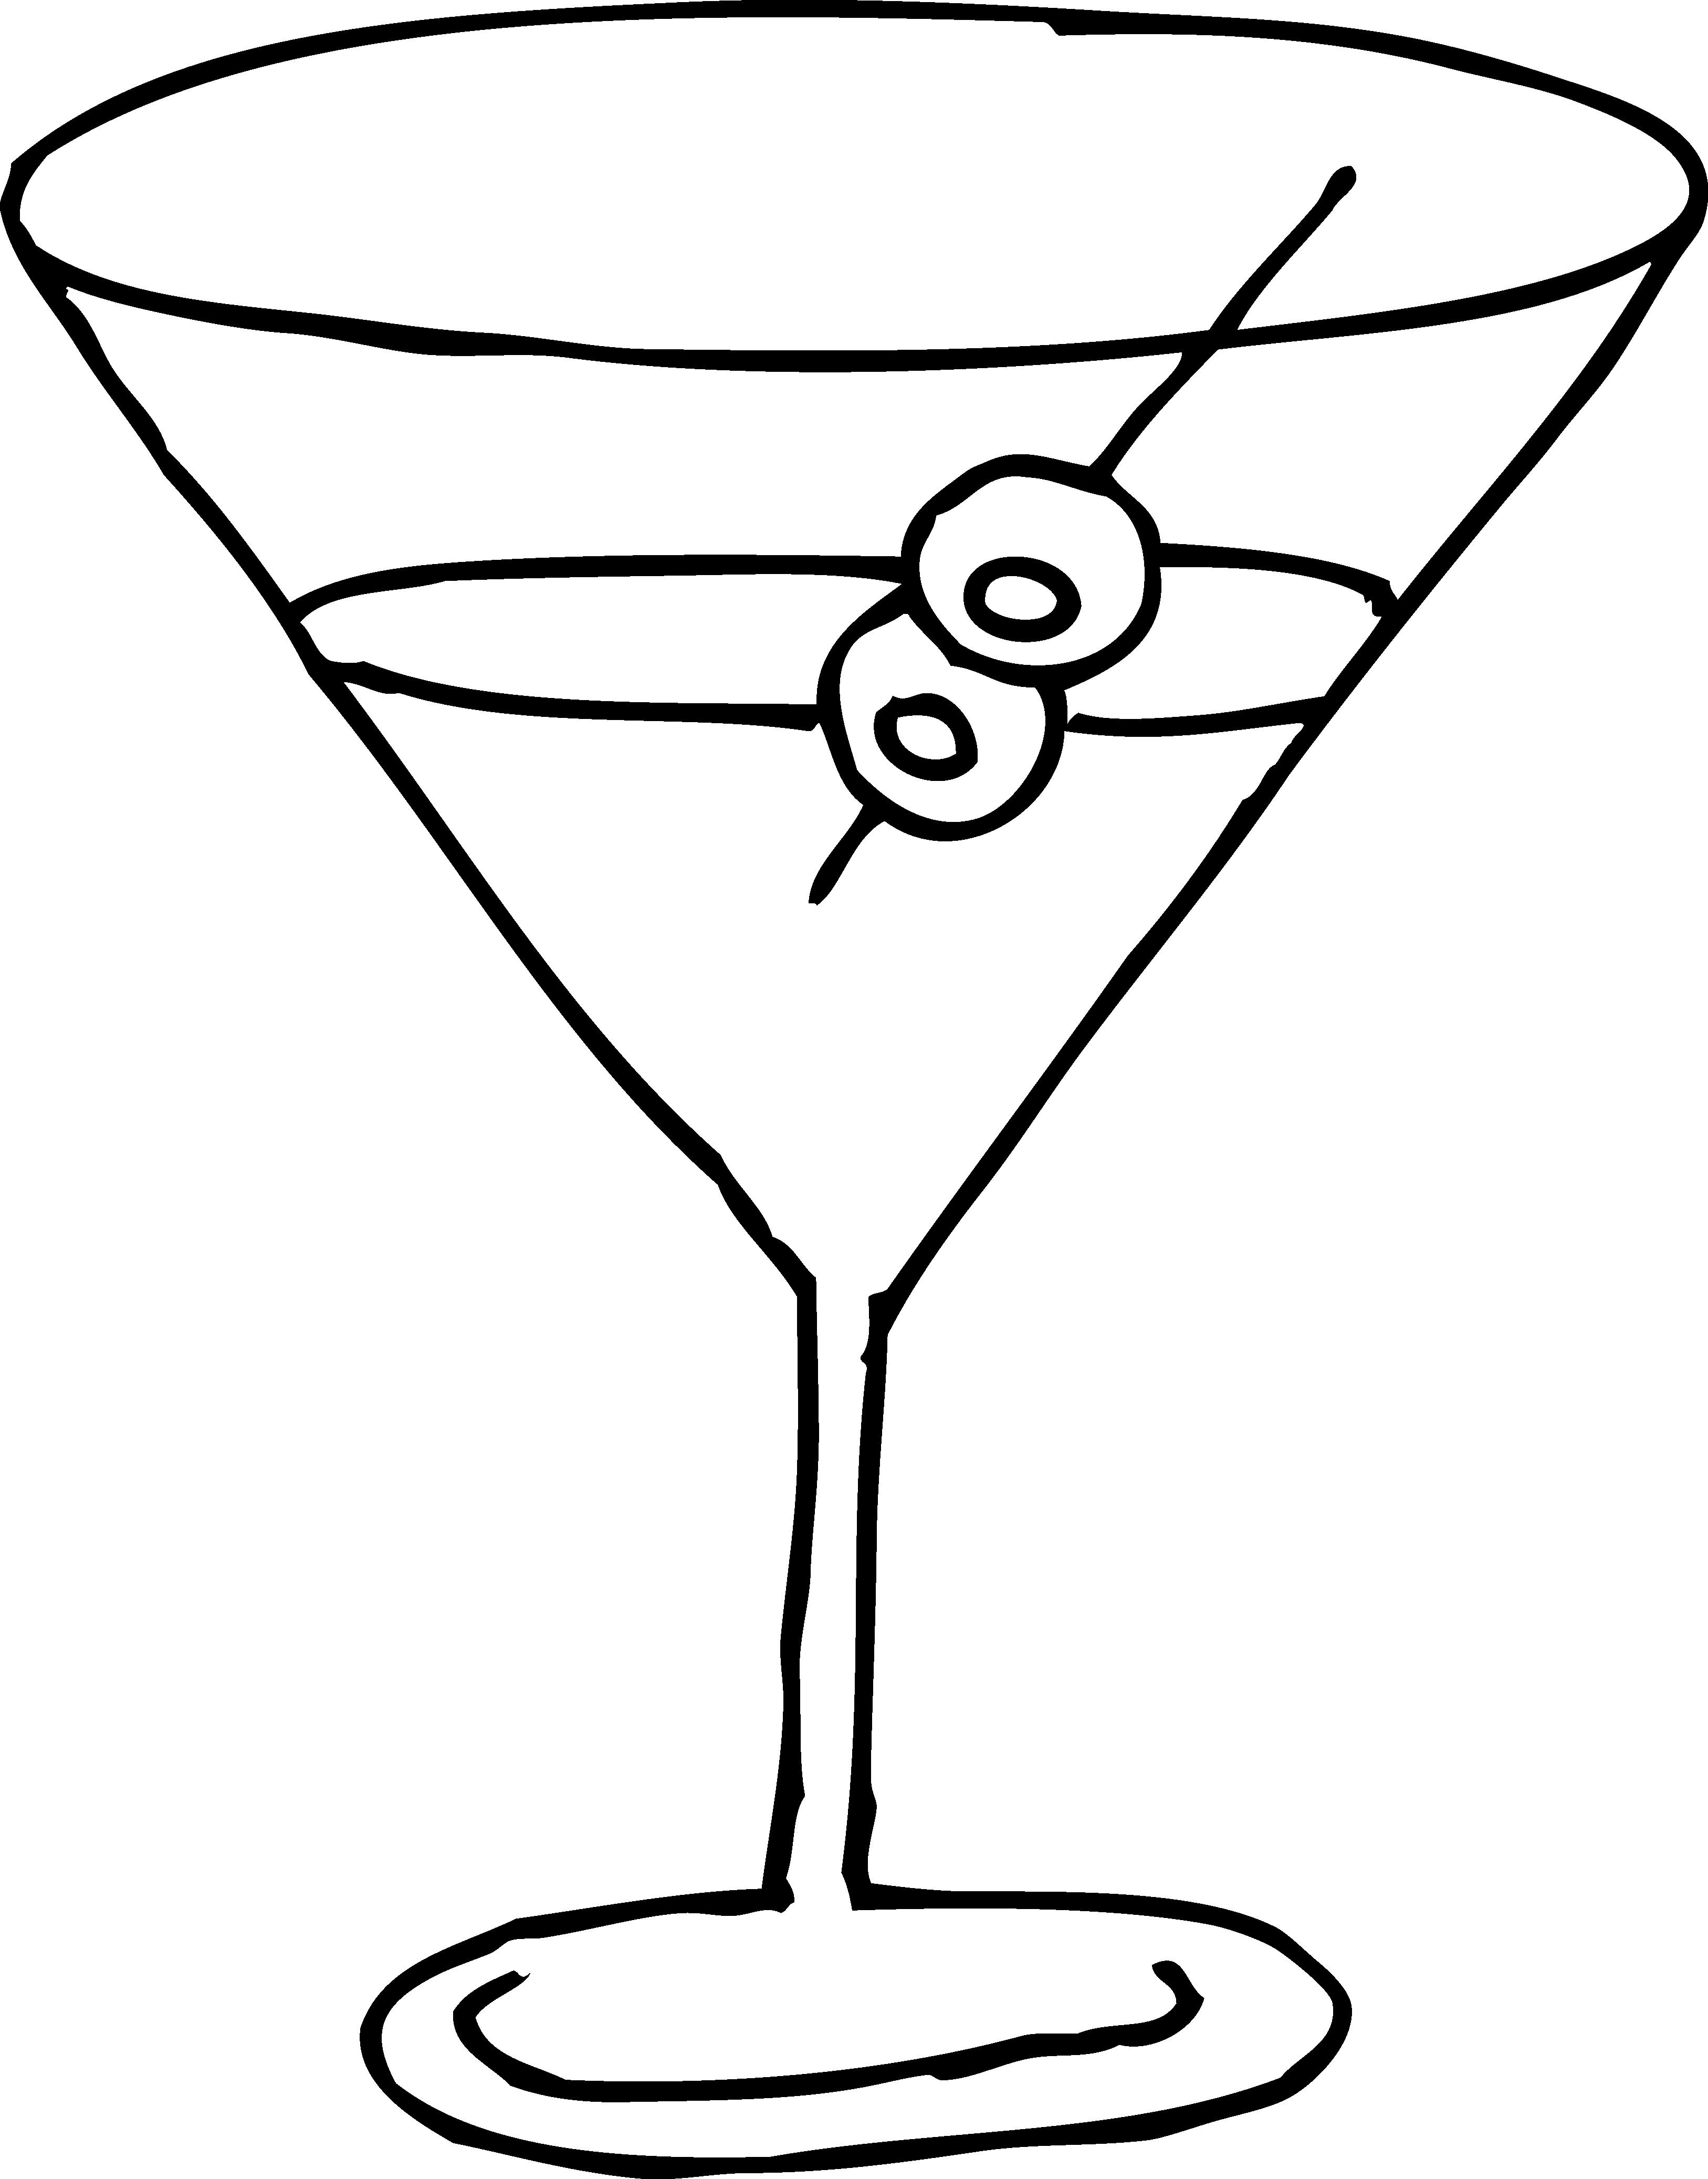 Martini glass line art free clip art